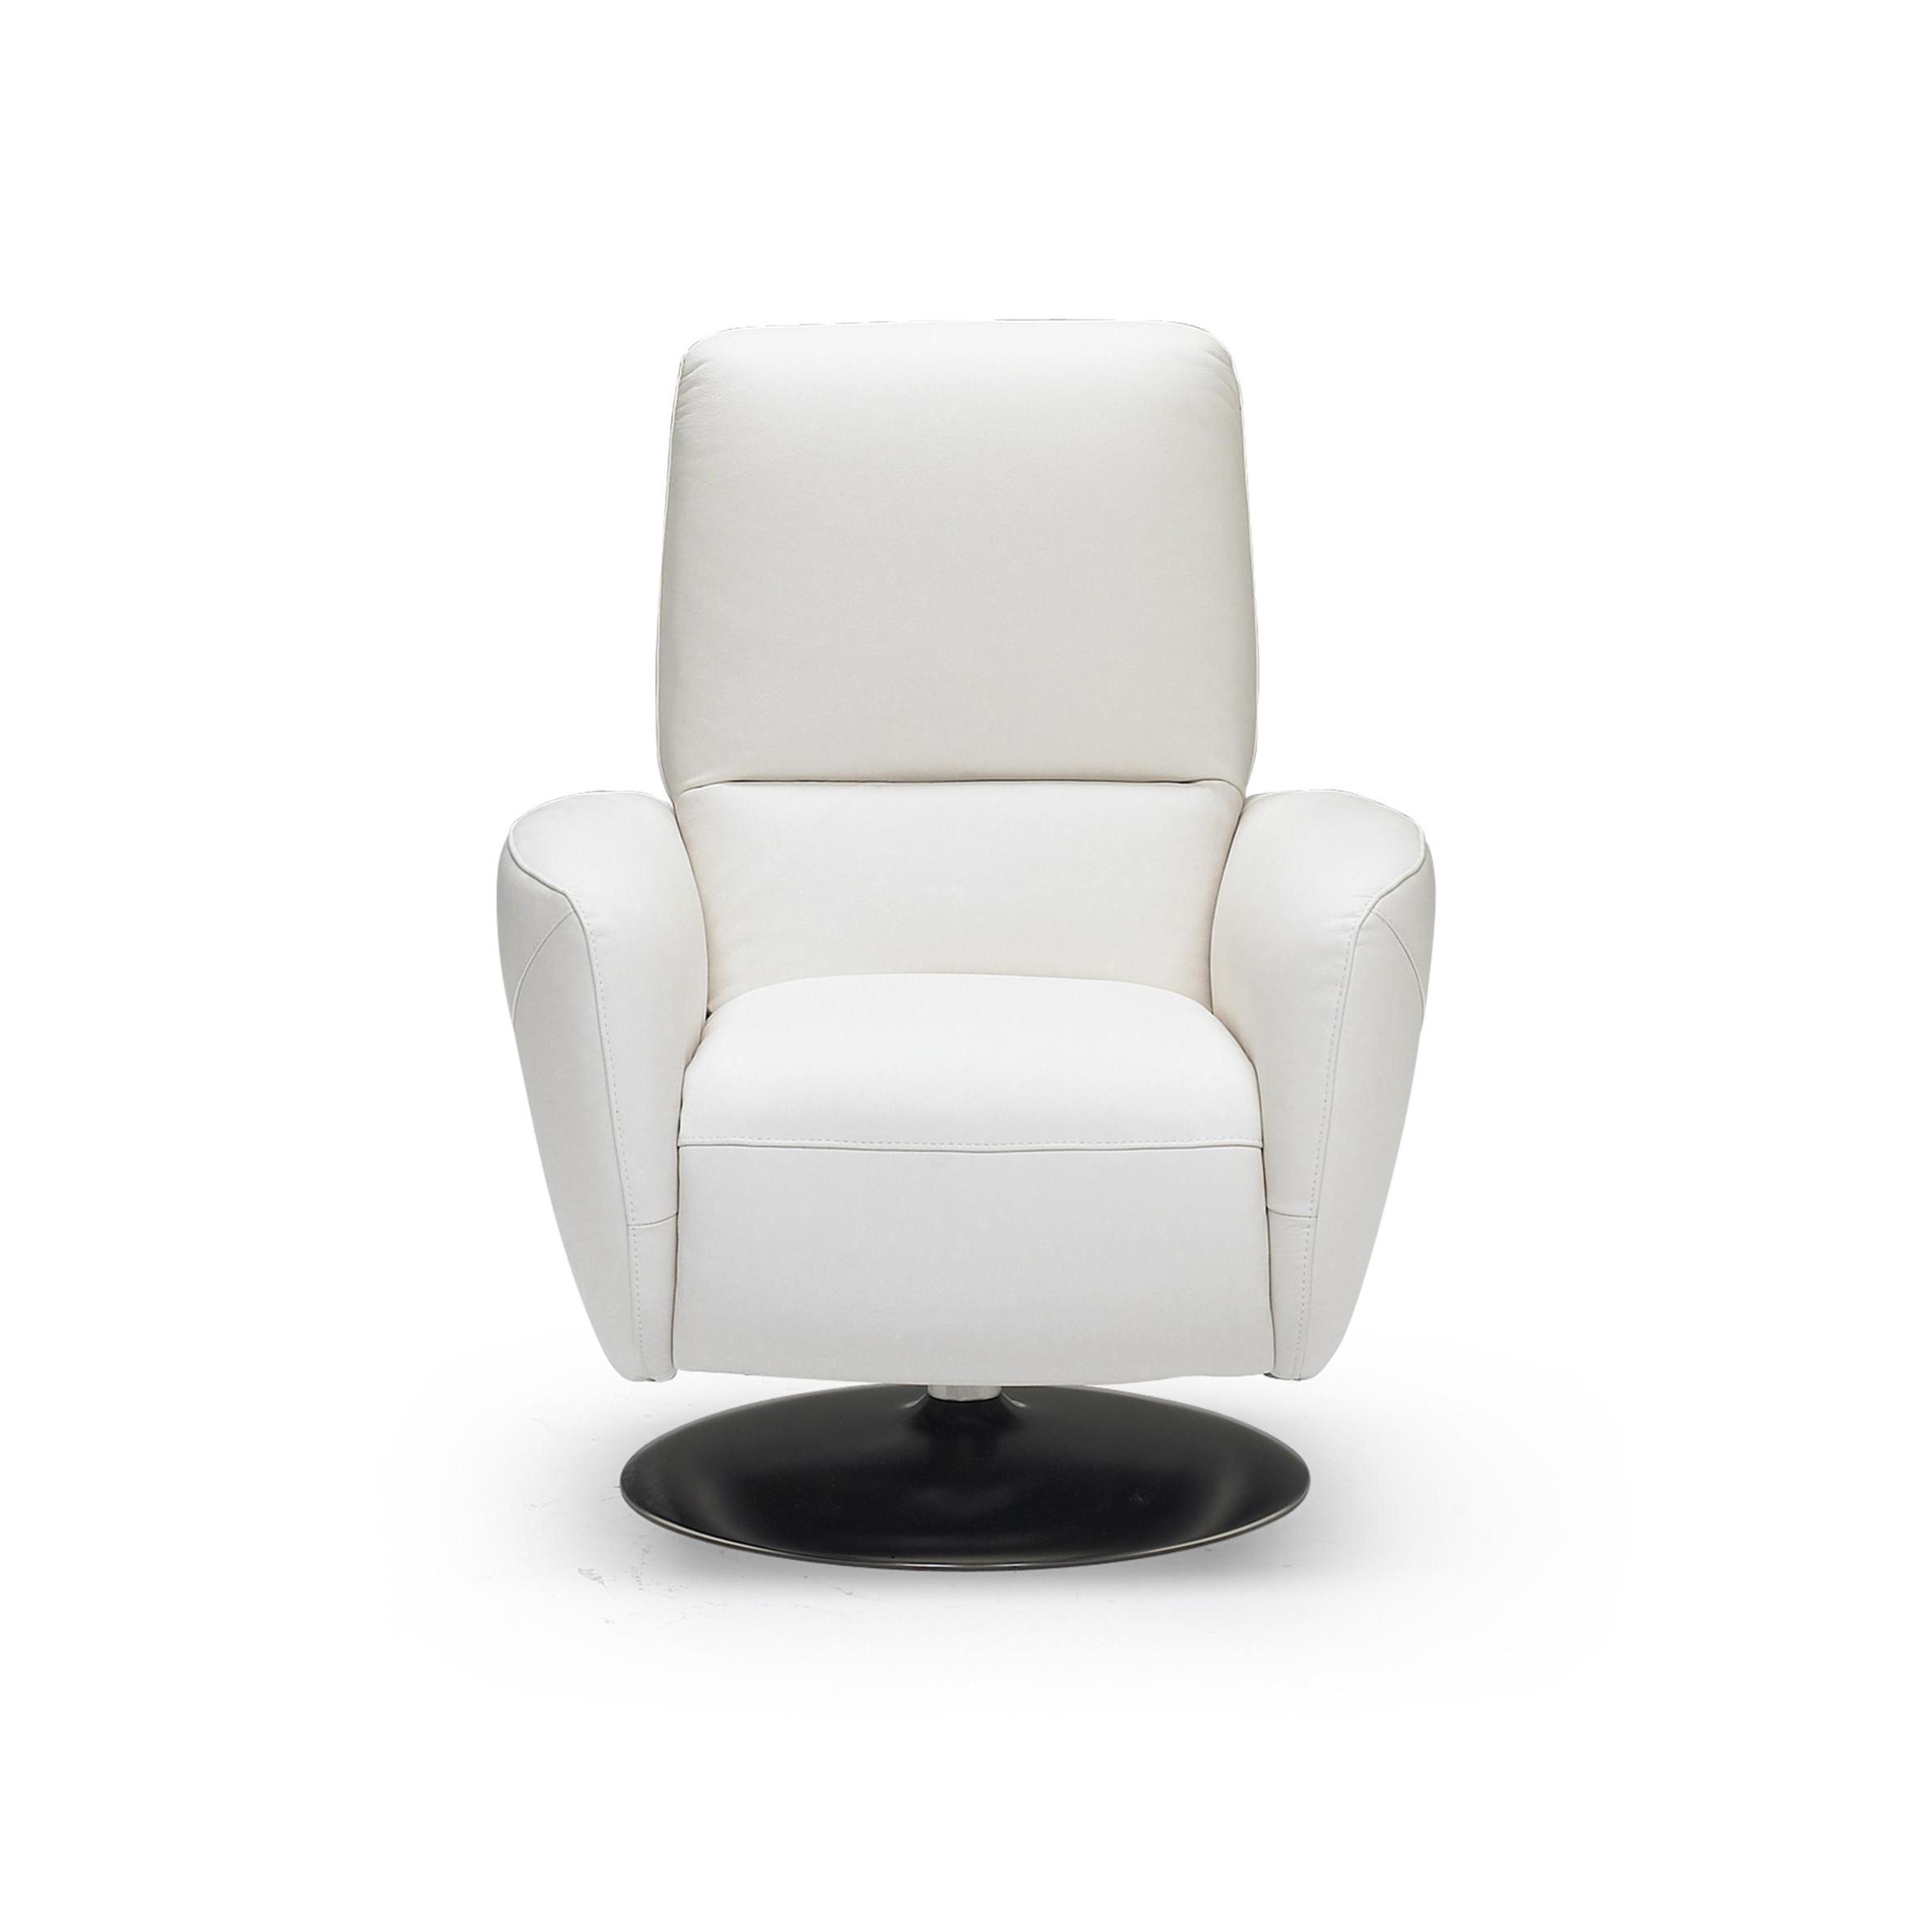 natuzzi swivel chair mickey mouse covers italia genny reclining